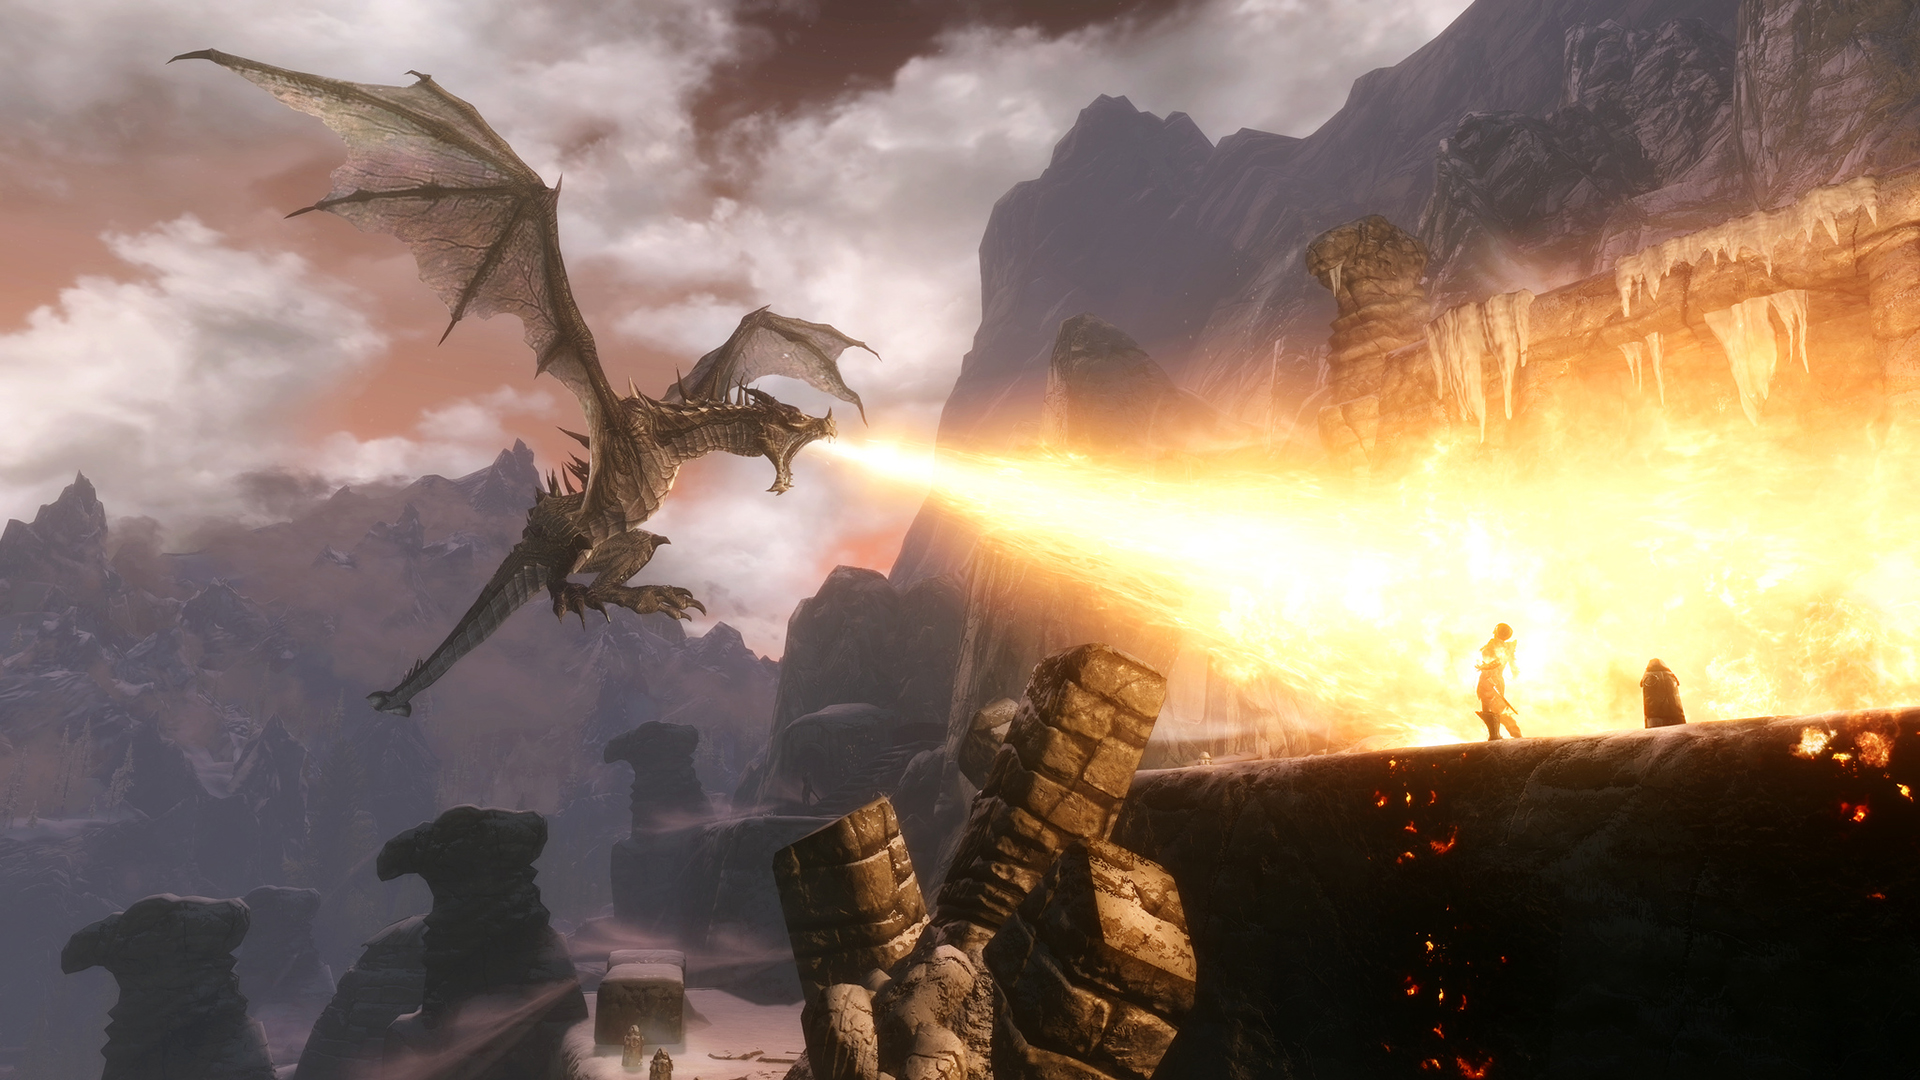 1366x768 dragon fire skyrim - photo #6